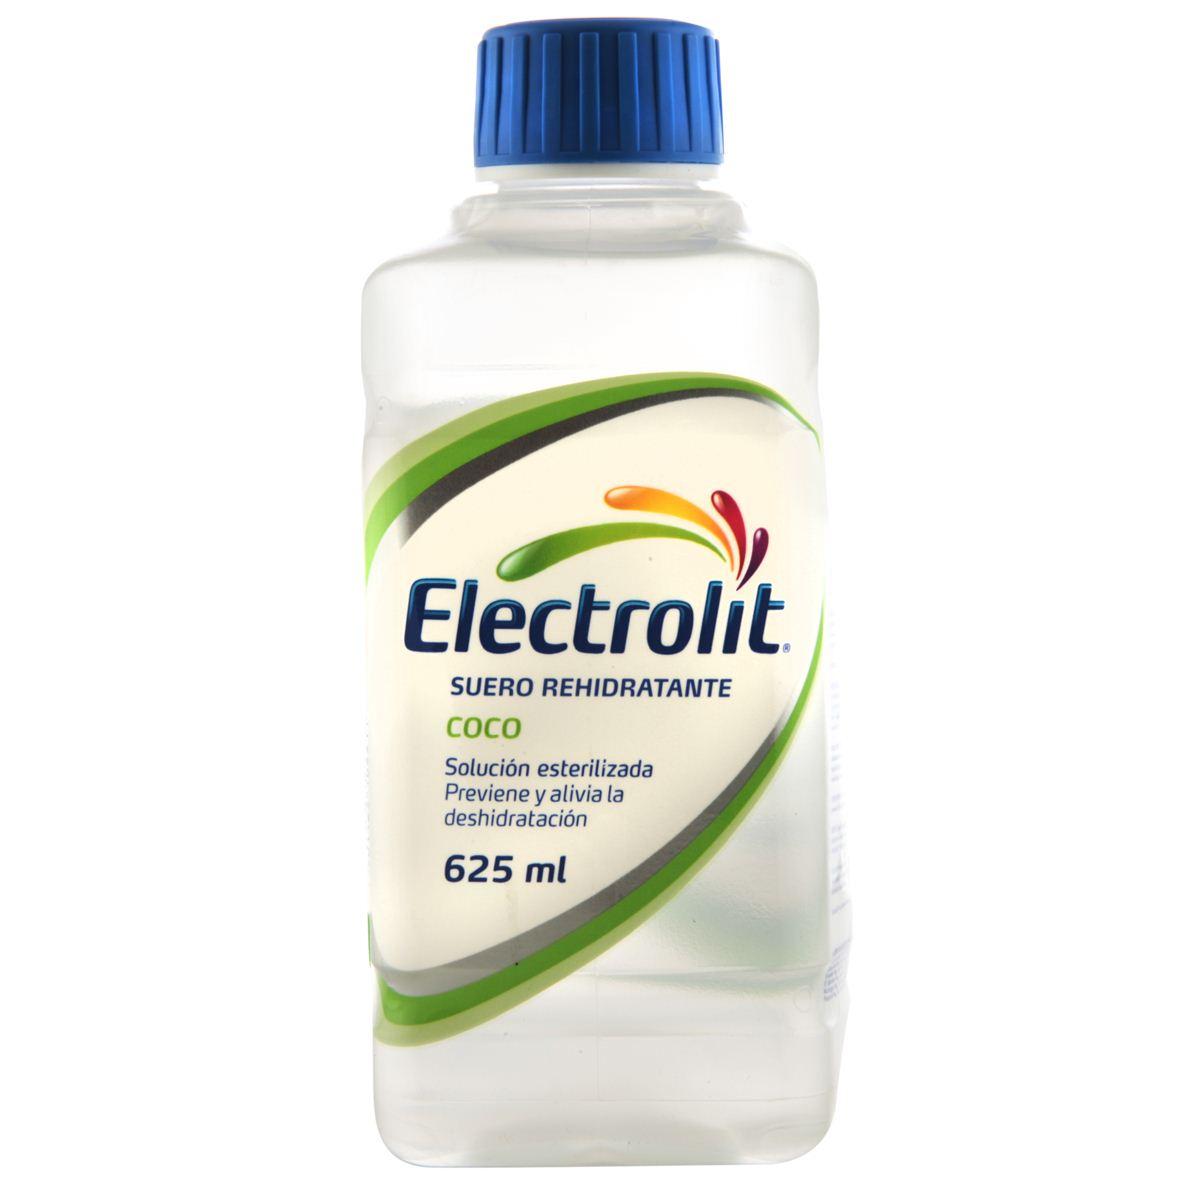 Electrolit suero rehidratante 625 ml coco  - Sanborns